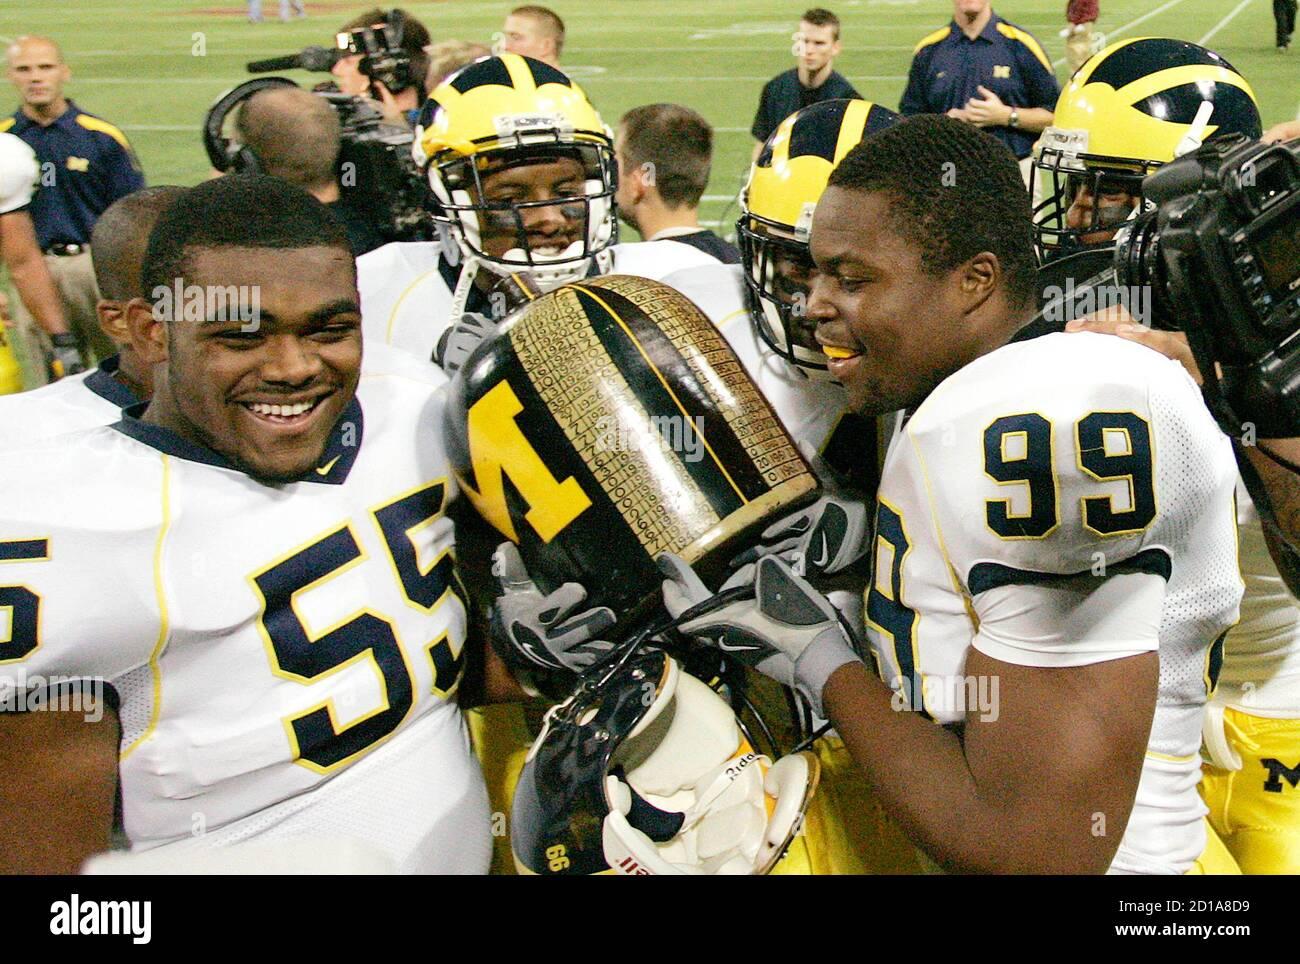 Brandon Graham Michigan Wolverines Football Jersey - Navy